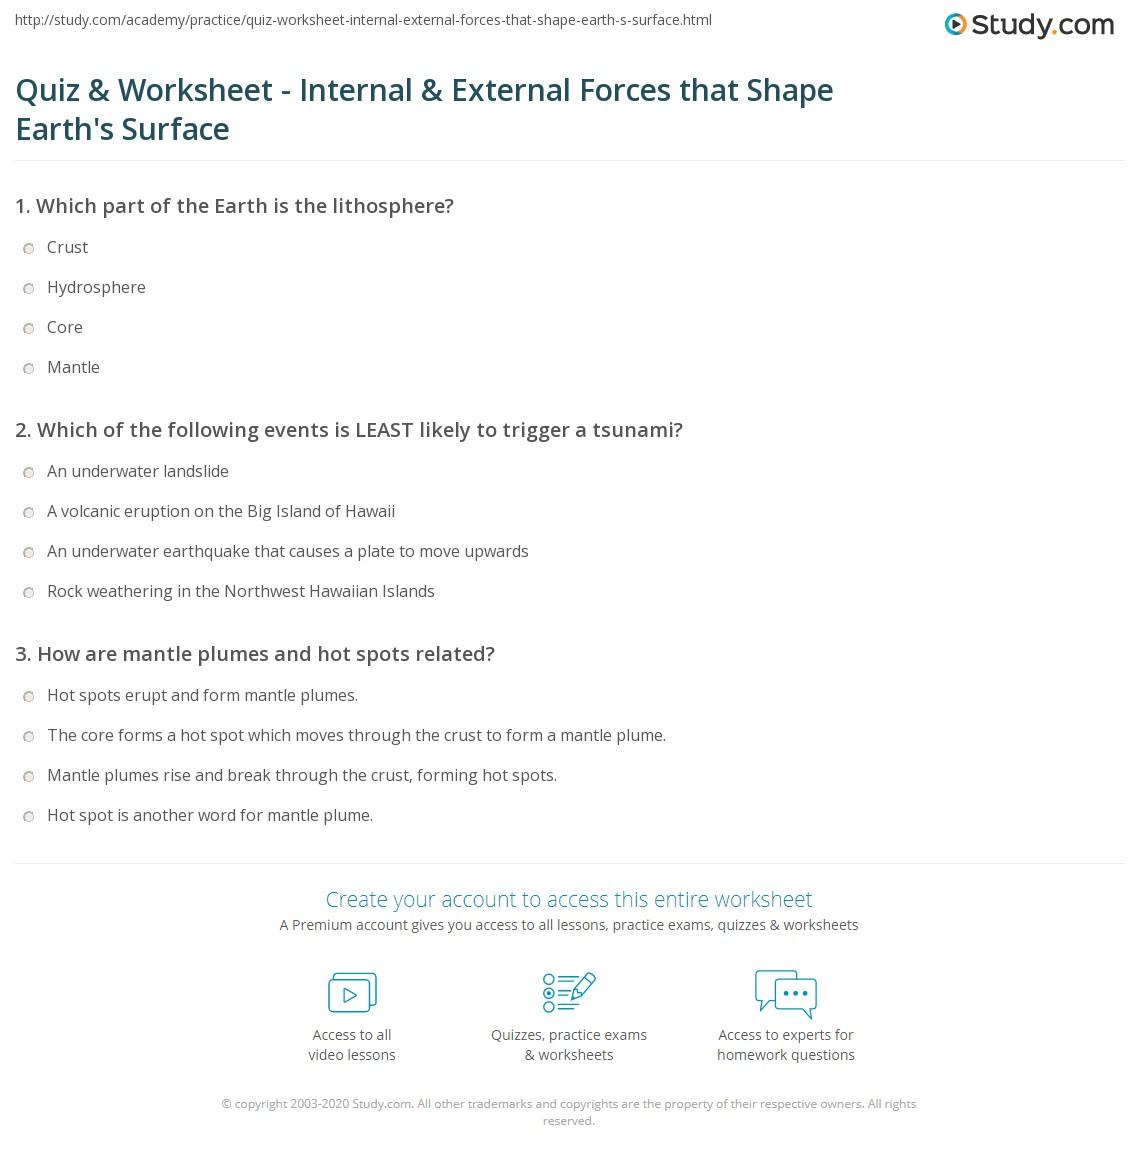 quiz worksheet internal external forces that shape earth 39 s surface. Black Bedroom Furniture Sets. Home Design Ideas